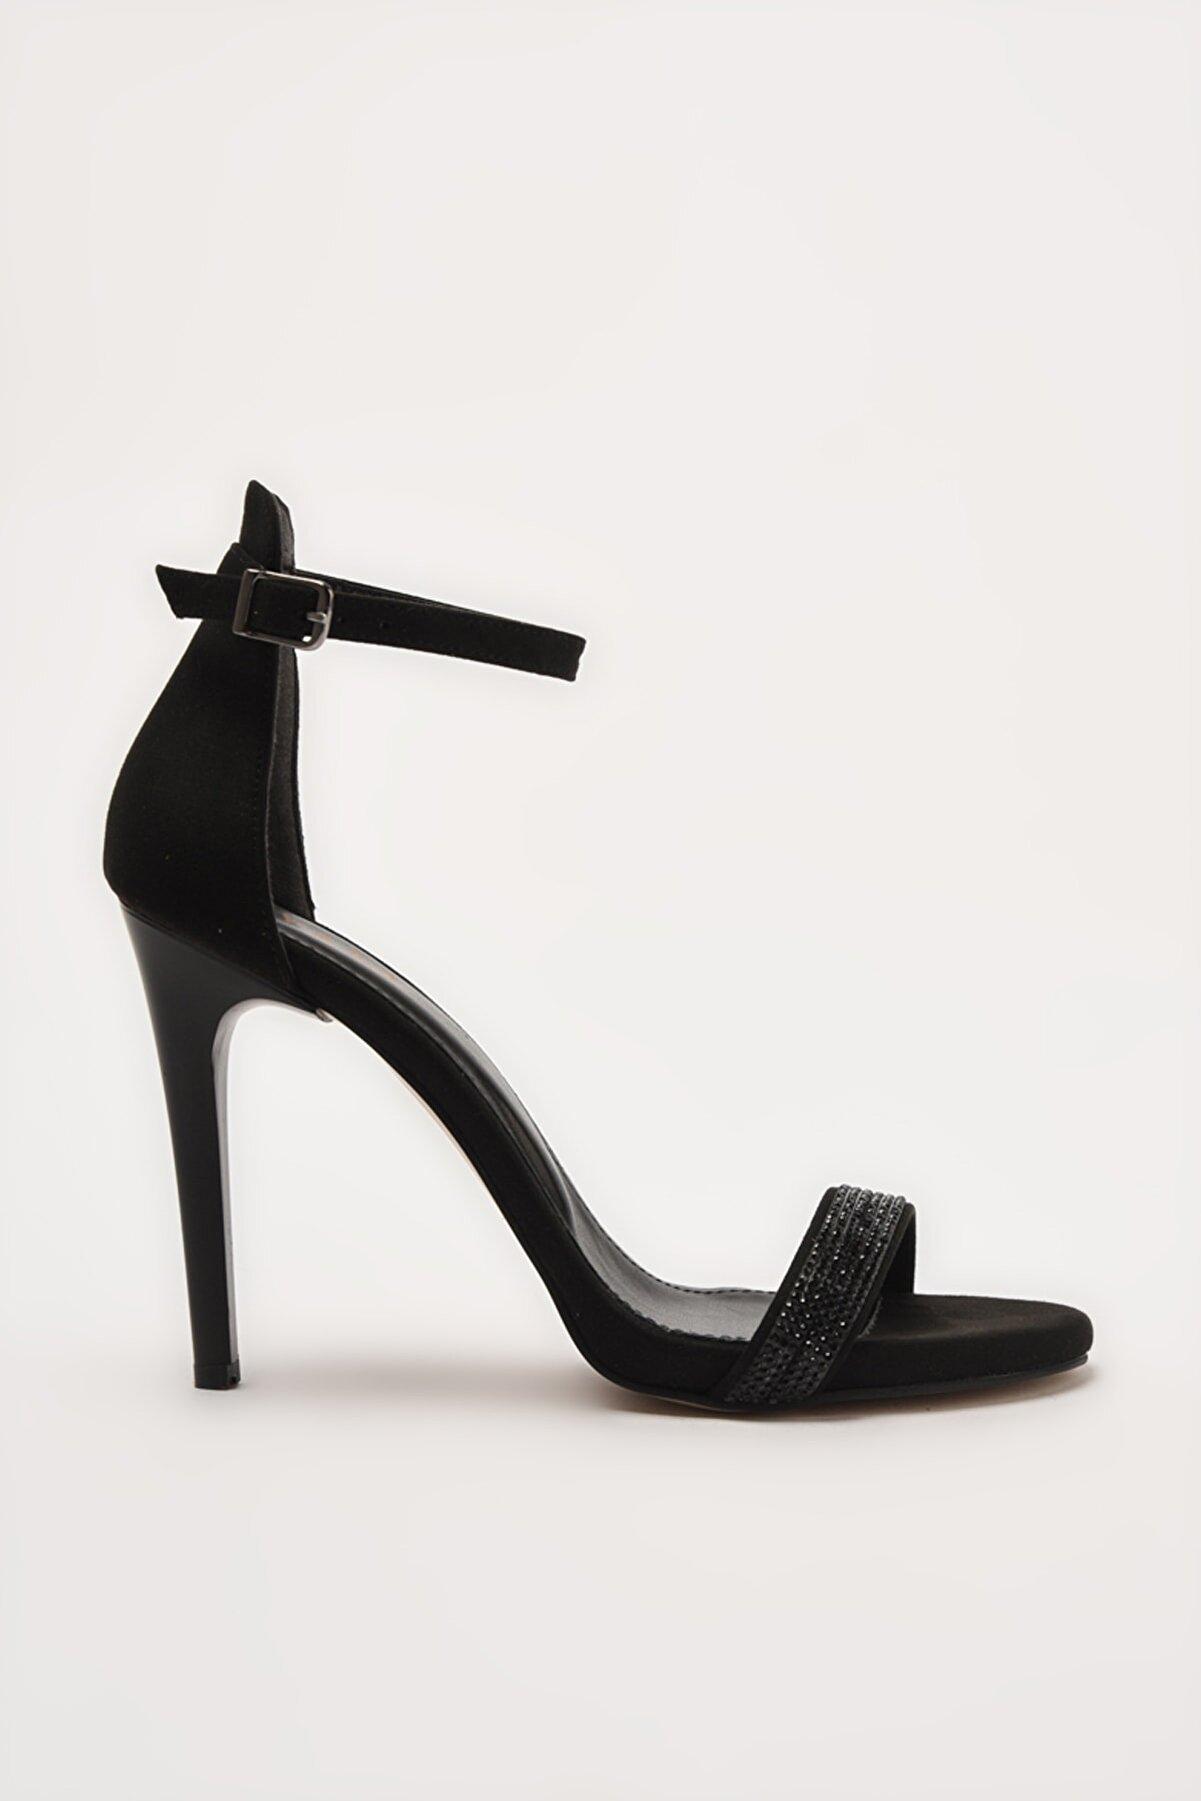 Yaya by Hotiç Siyah Kadın Sandalet 01SAY207540A100